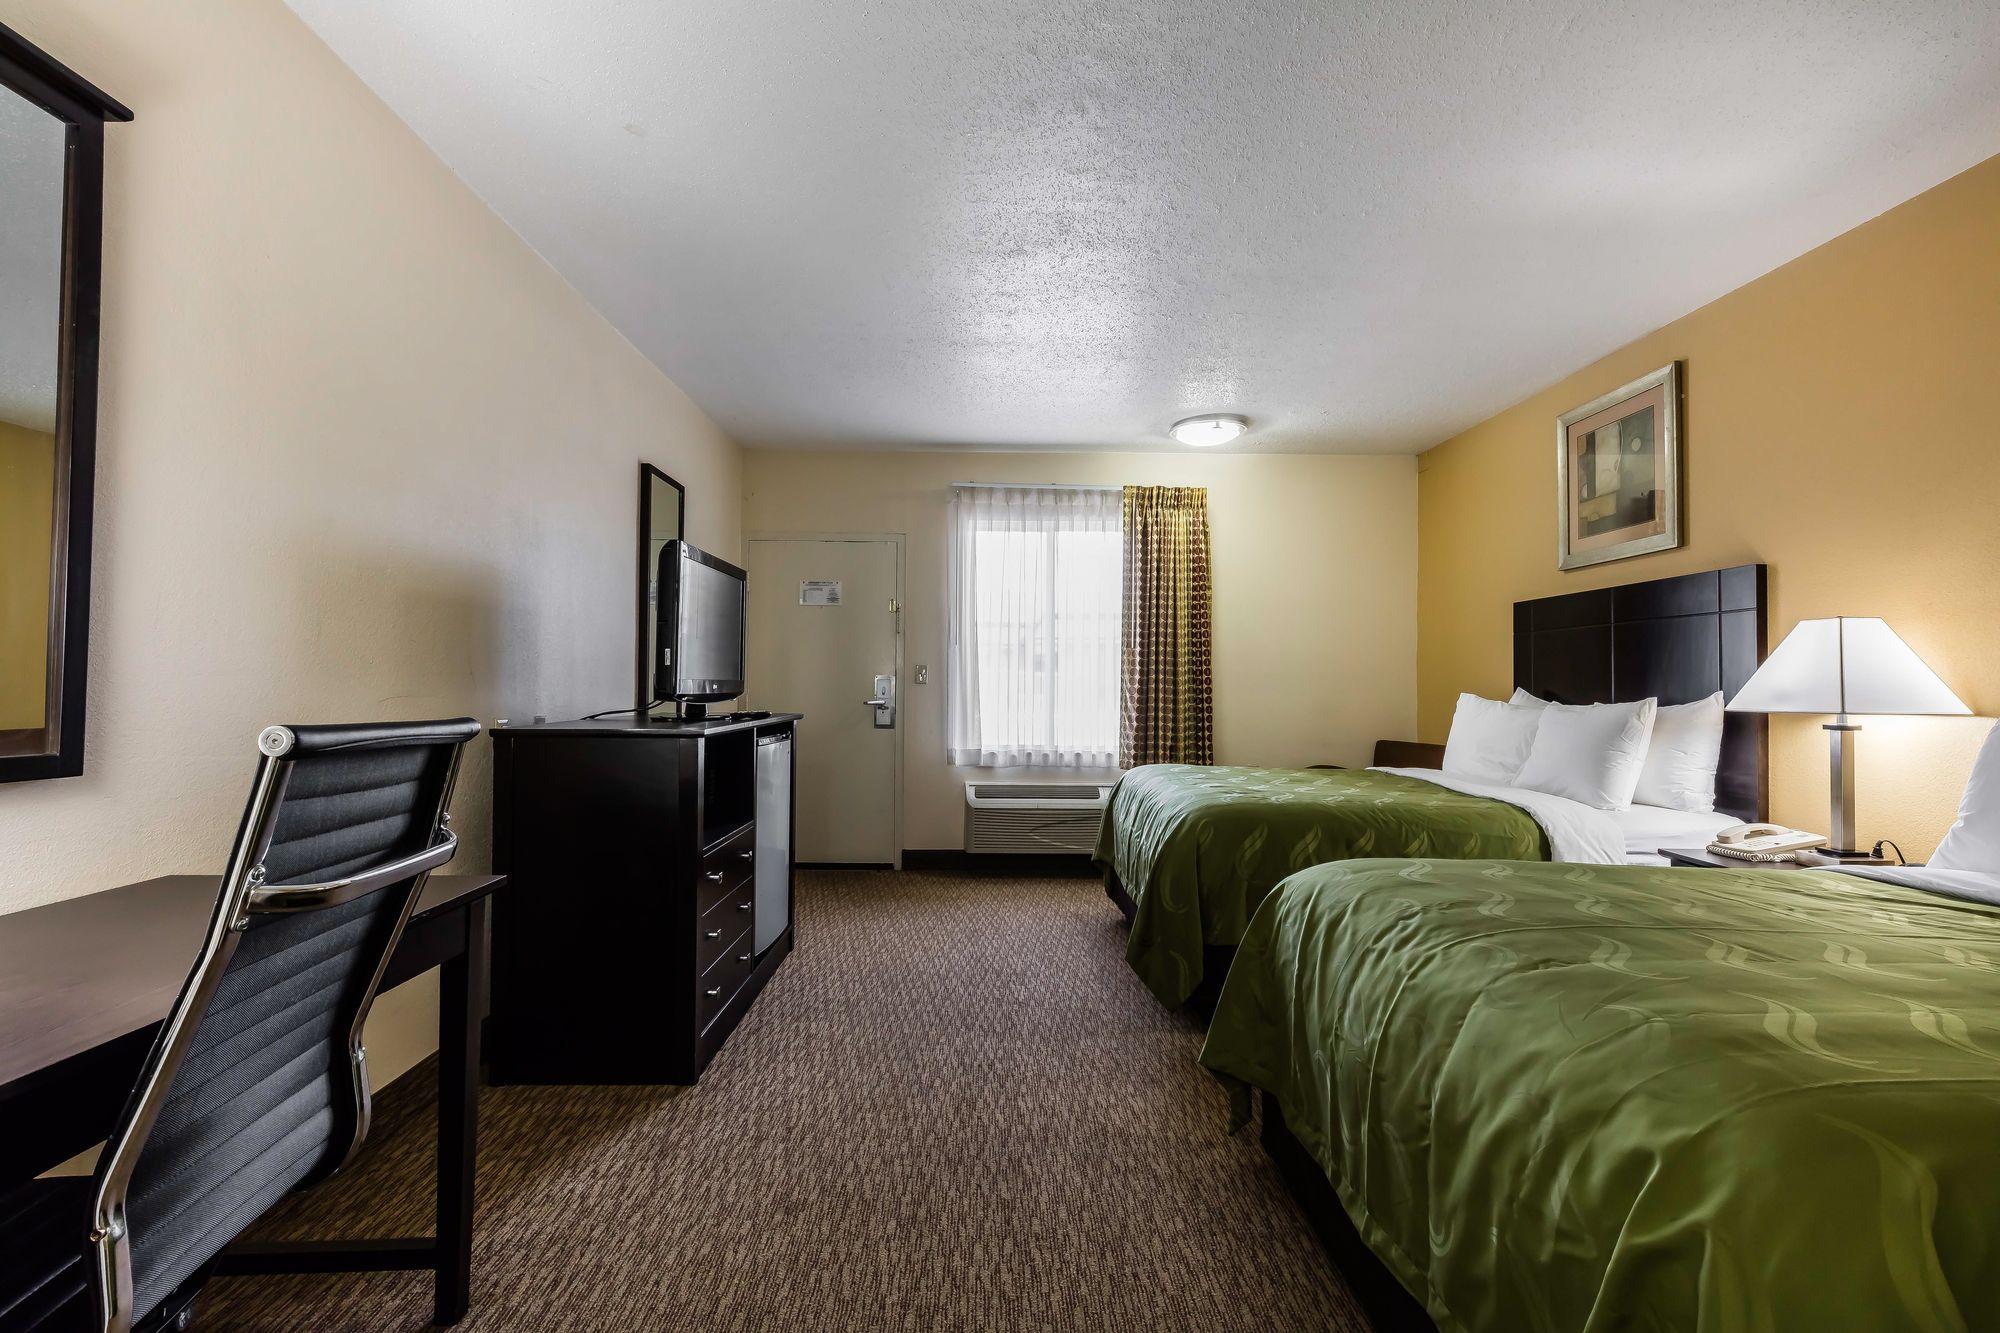 Quality Inn Tullahoma in Tullahoma, TN